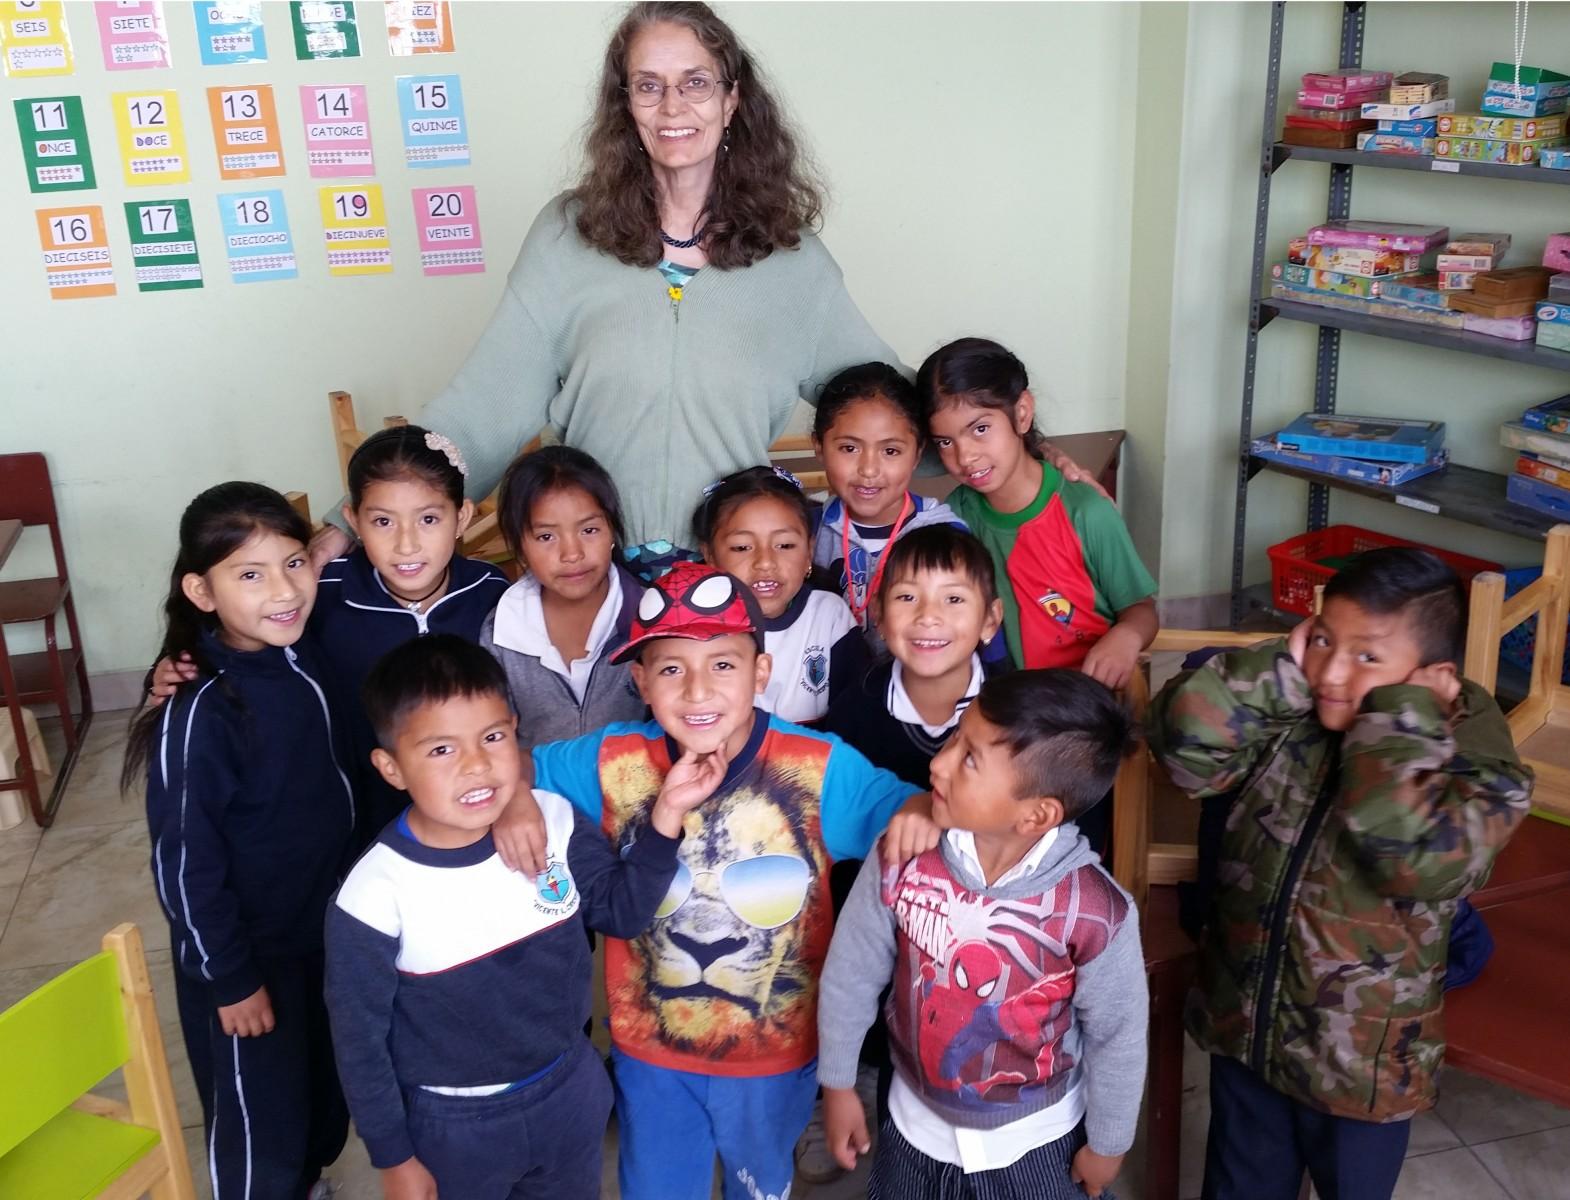 Volunteer Report from Arlene - Pro Minadores de Suenos